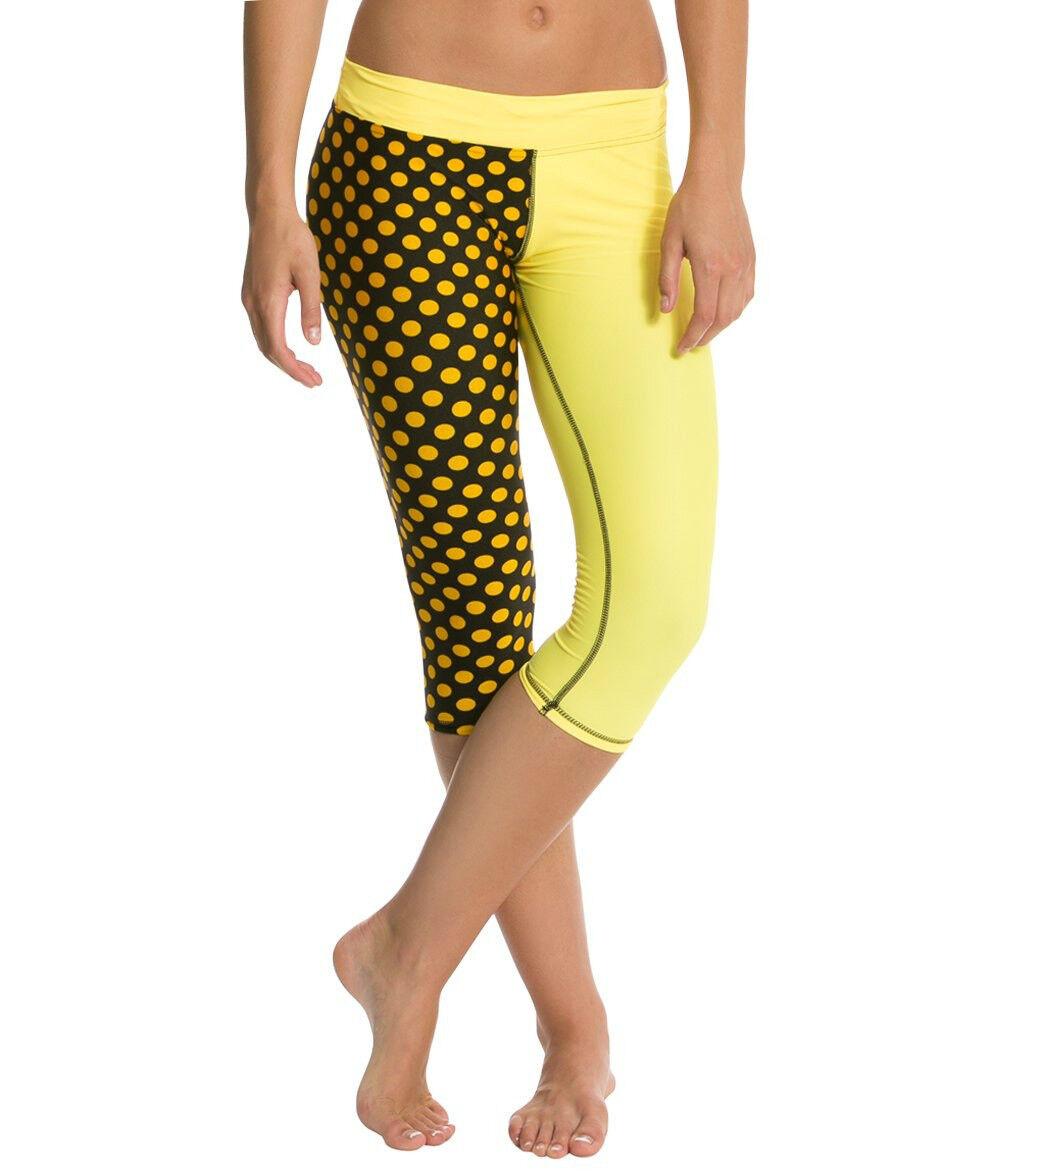 Mahiku Rome Kini Capri Sport Leggings Yellow Polka Dot NWT Activewear Hawaii